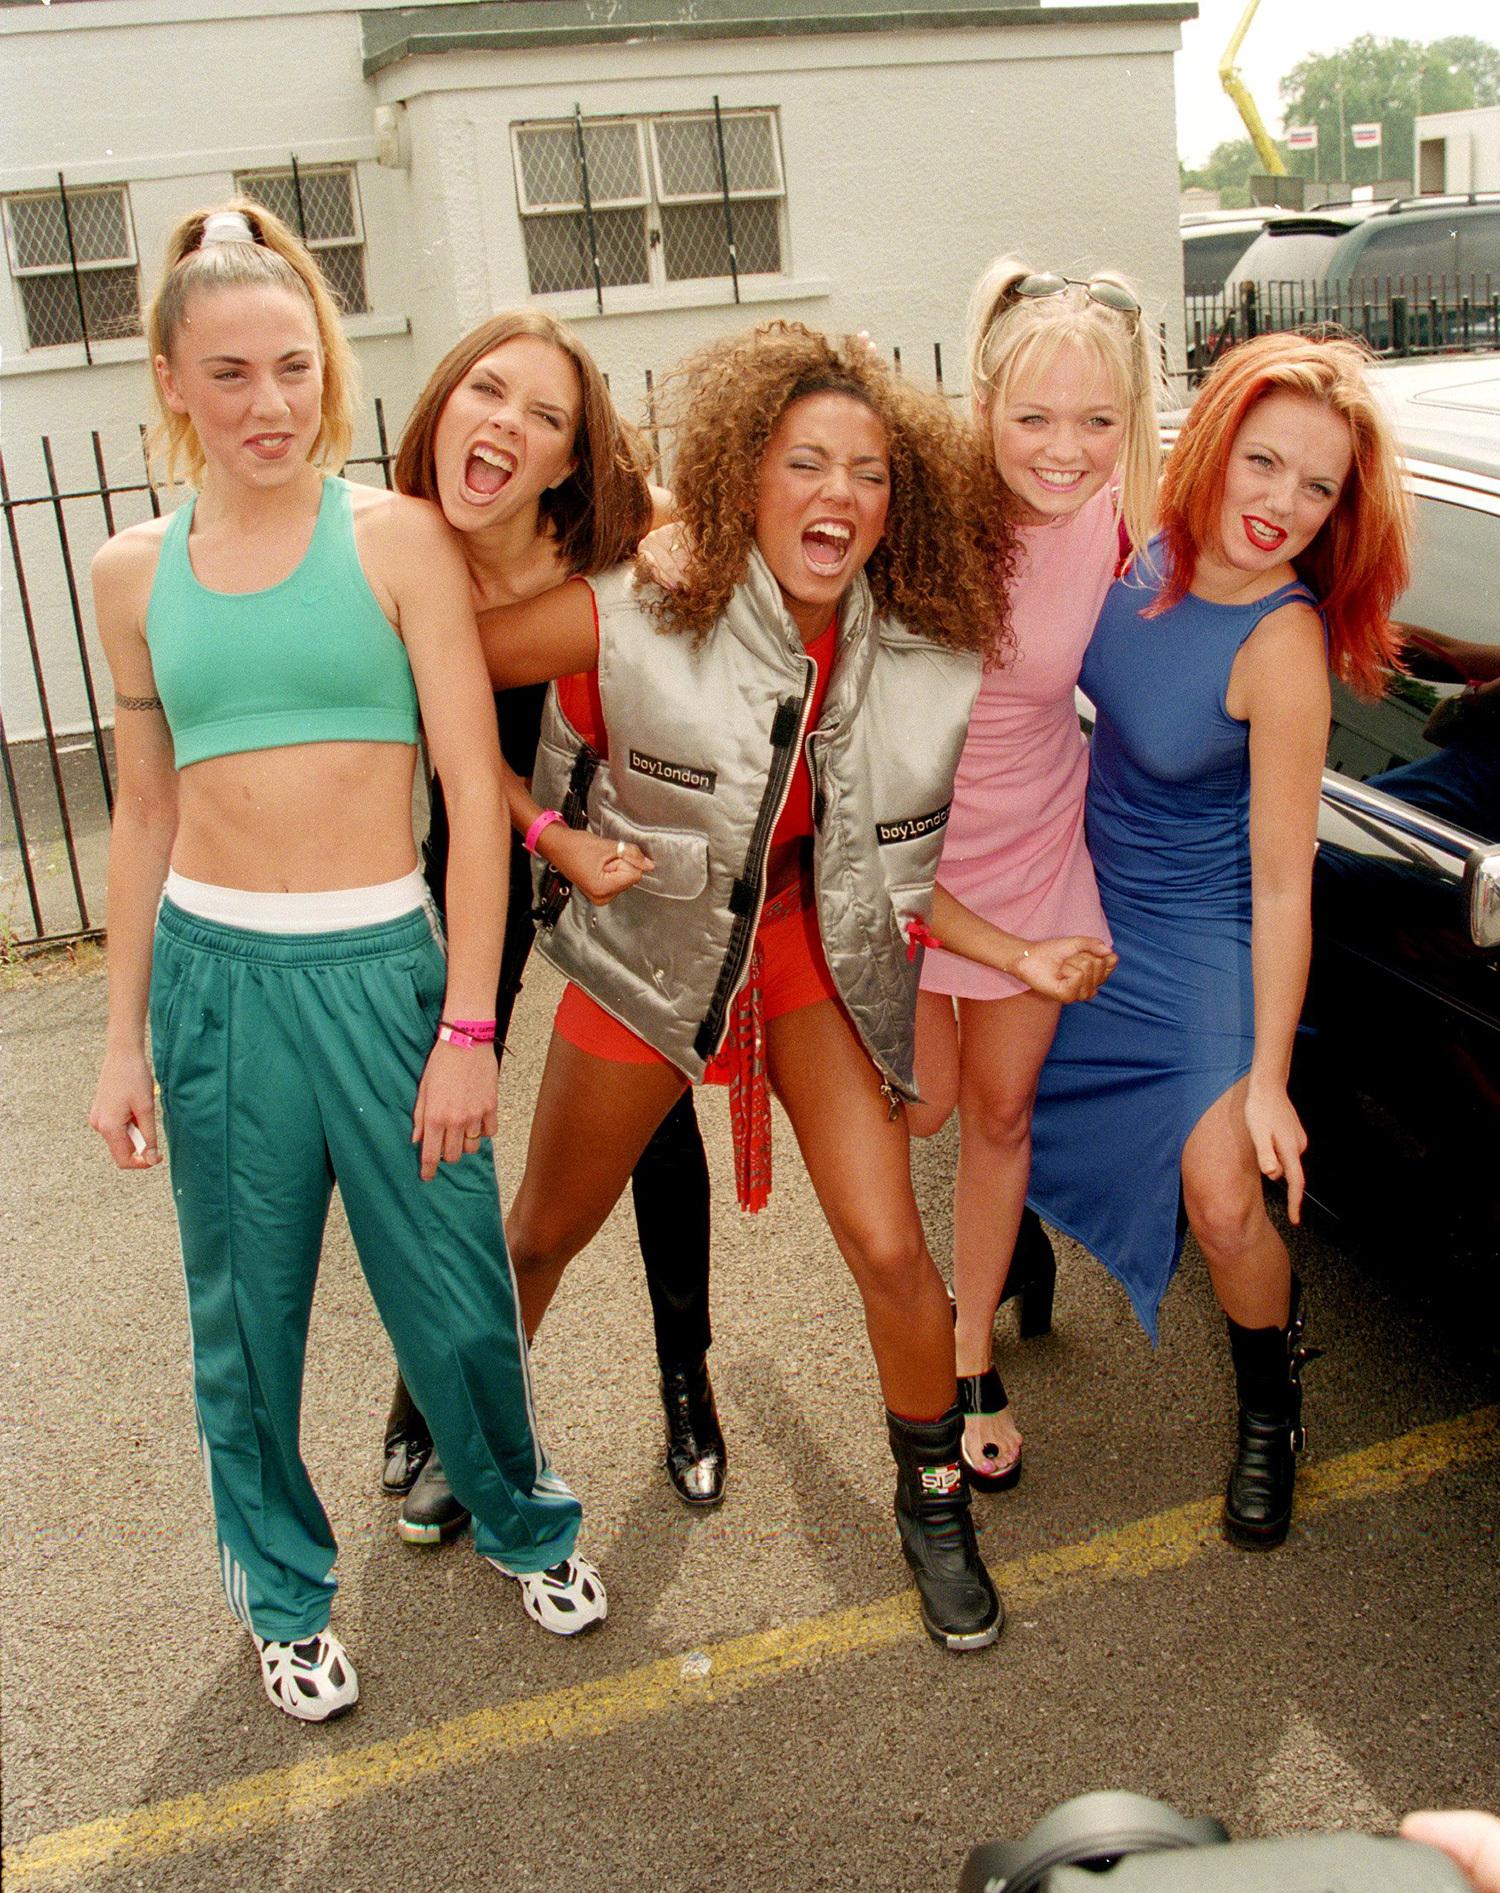 Feet Spice Girls nudes (52 photo), Sexy, Sideboobs, Twitter, cameltoe 2015